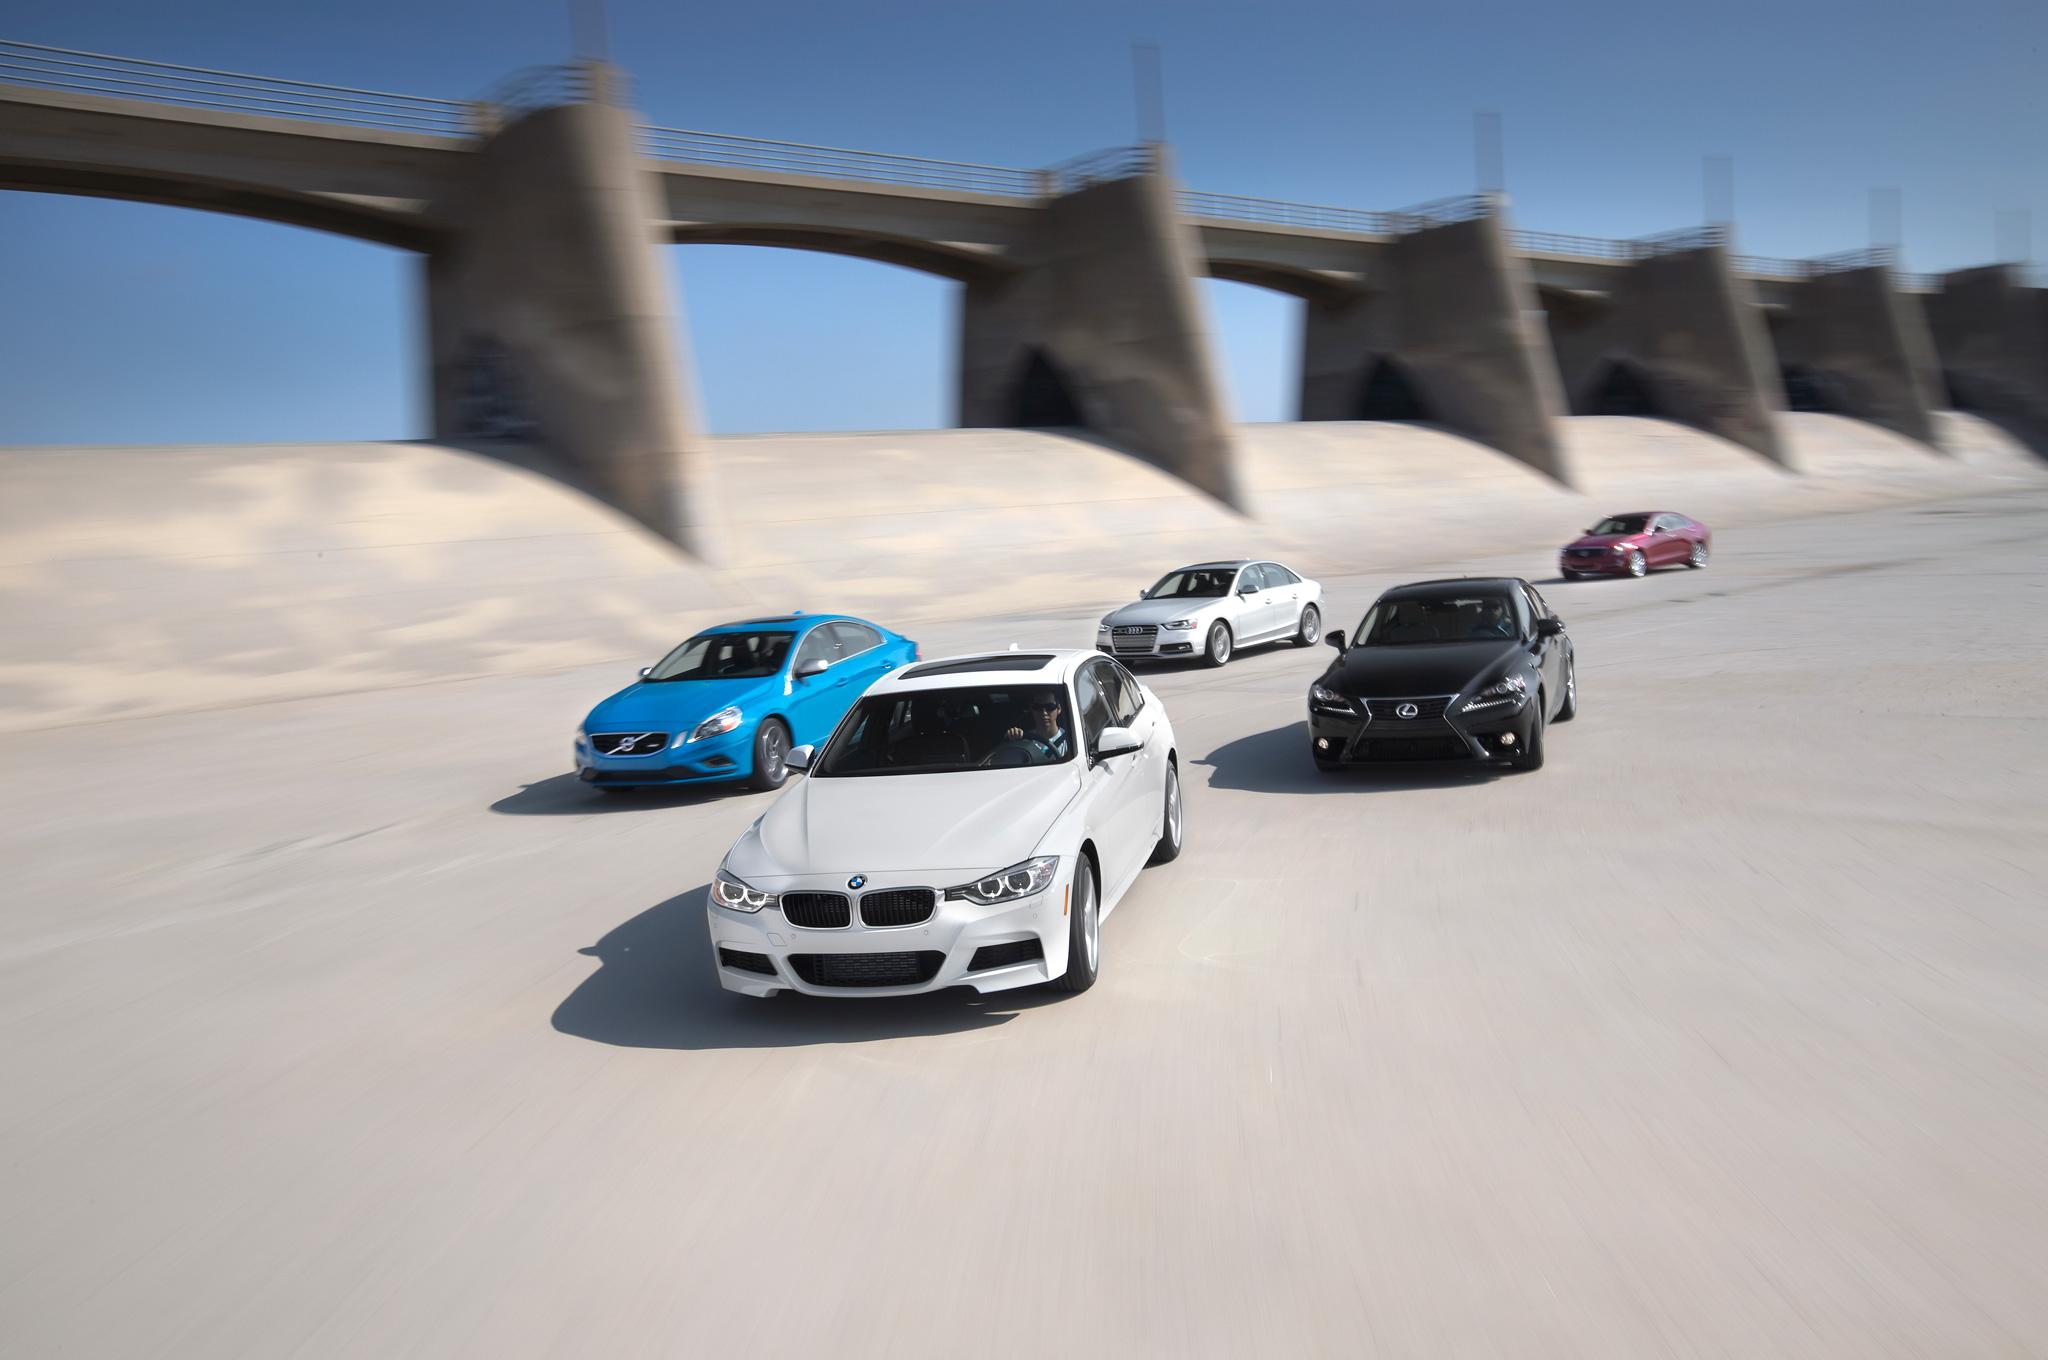 Luxury Sport Sedans Comparison By Motor Trend BMW Wins - Sports car comparison